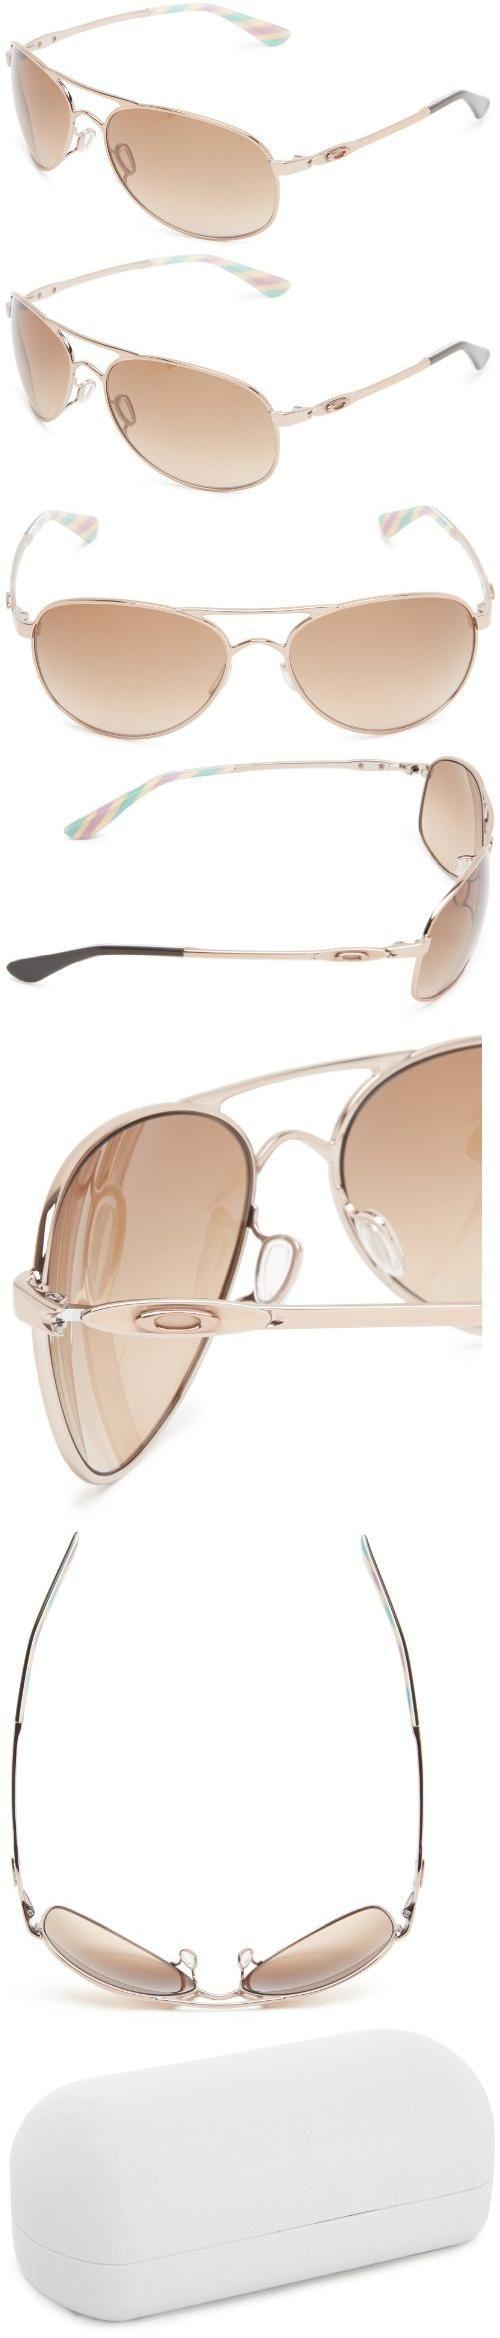 Oakley Aviator Sunglasses, Rose Gold